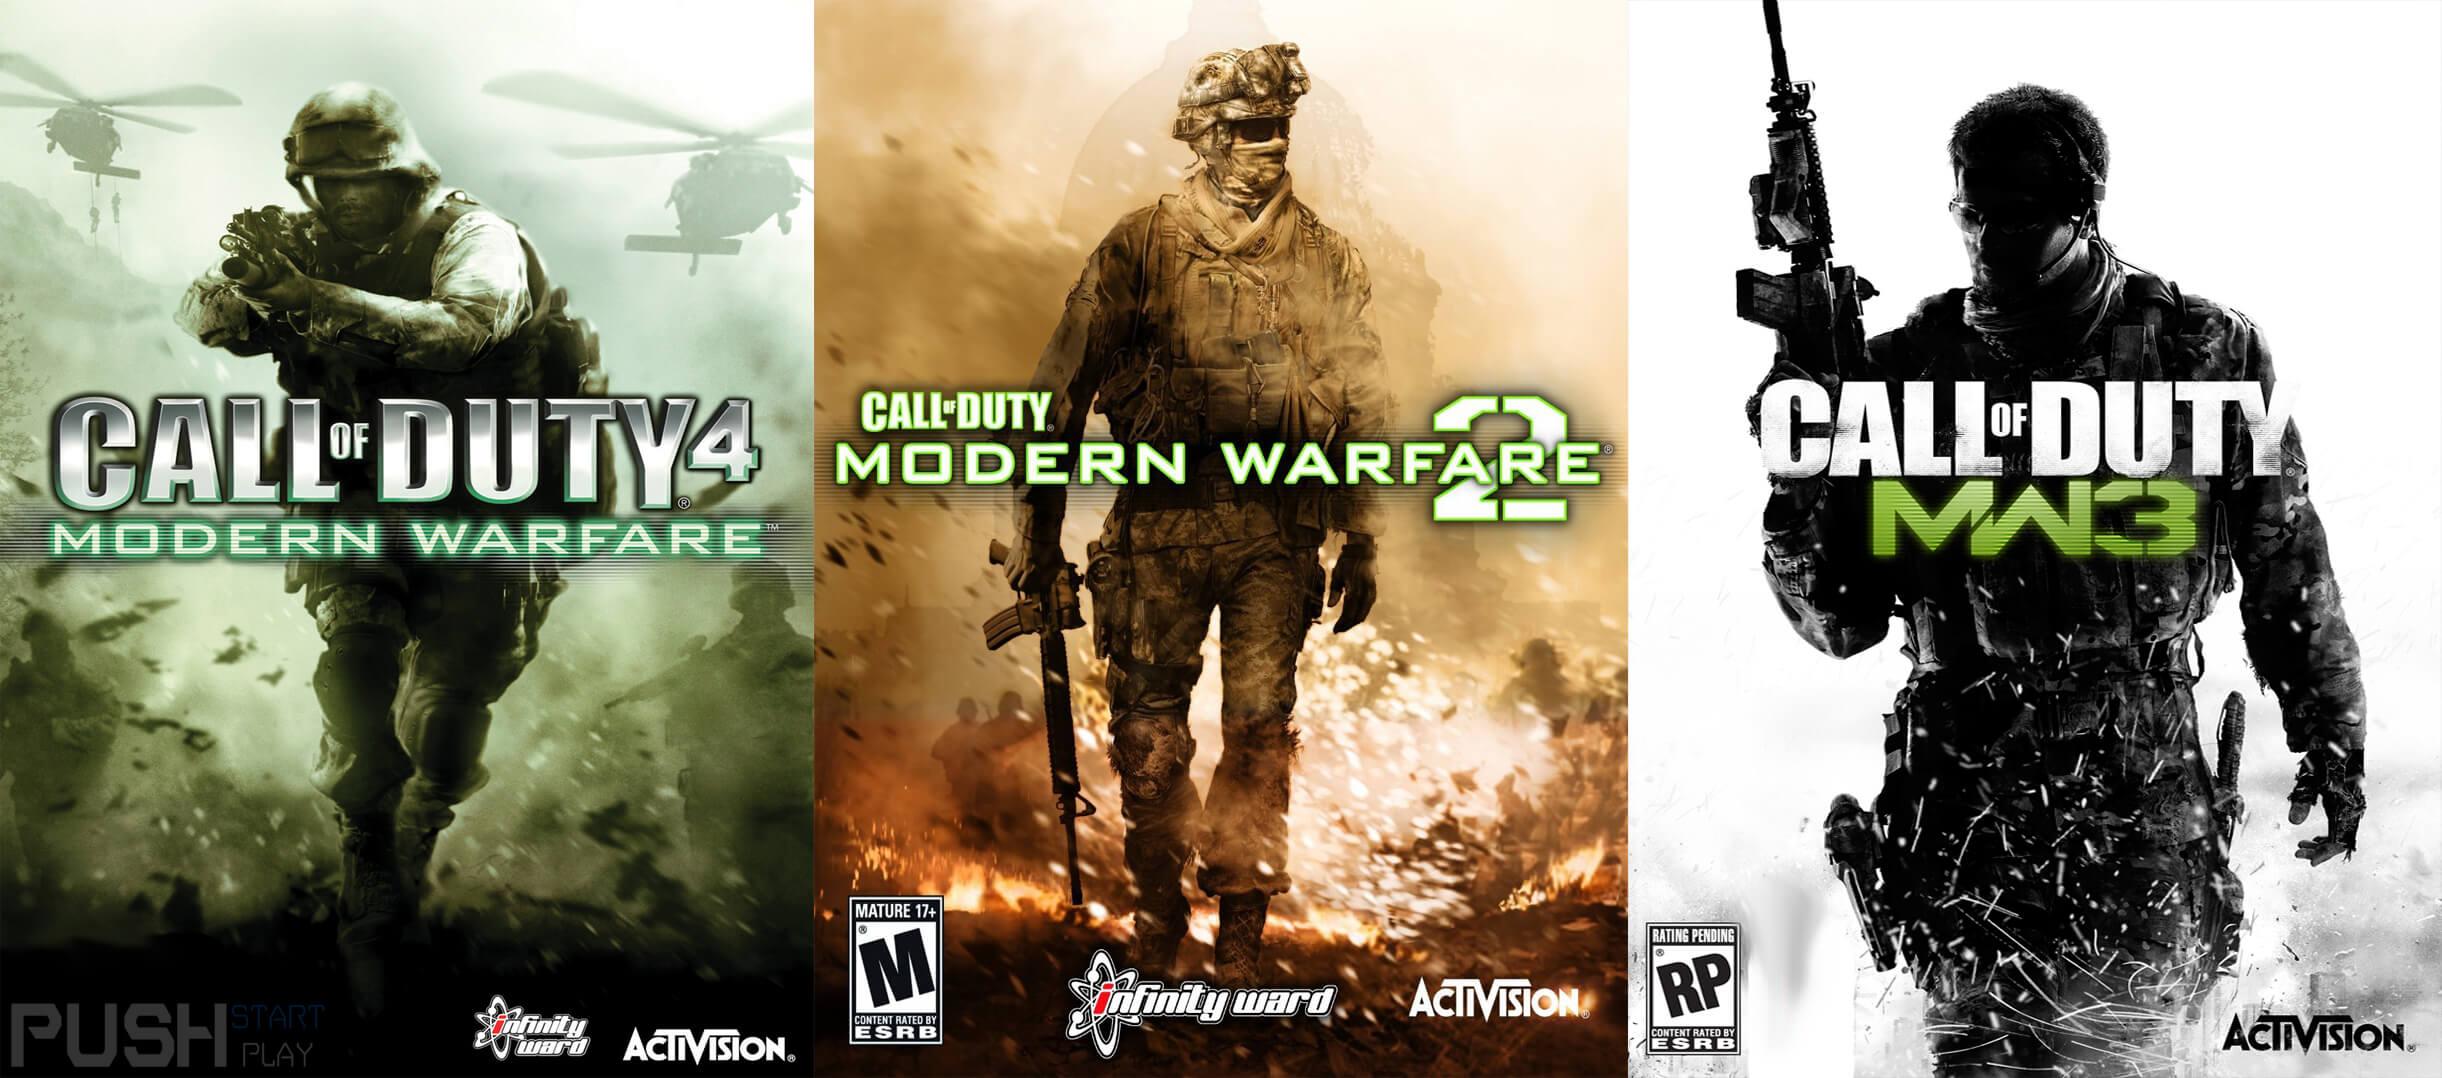 Modern warfare trilogy 2